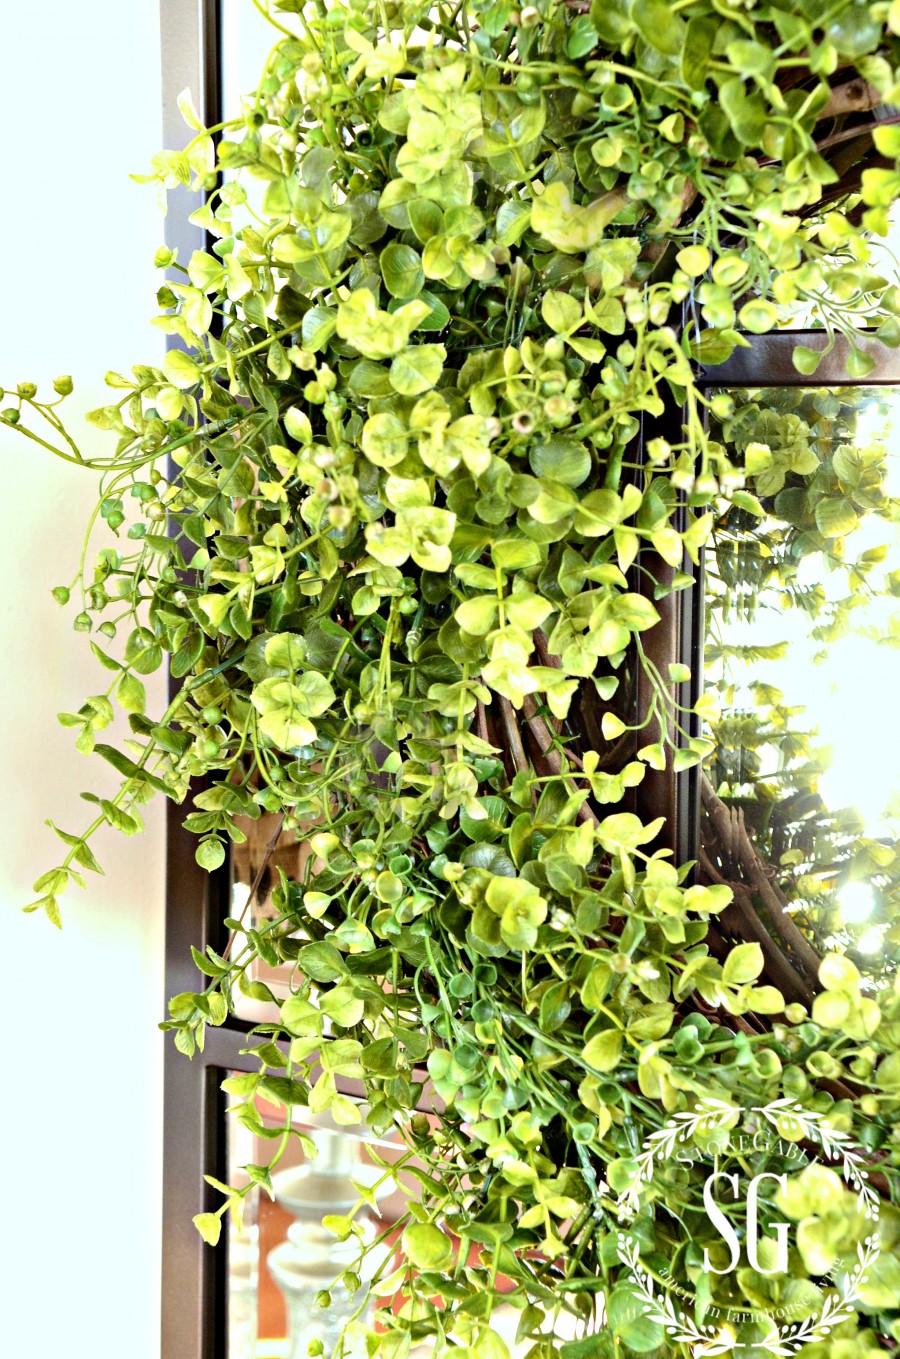 BOXWOOD WREATH IN THE FOYER-close up-stonegableblog.com